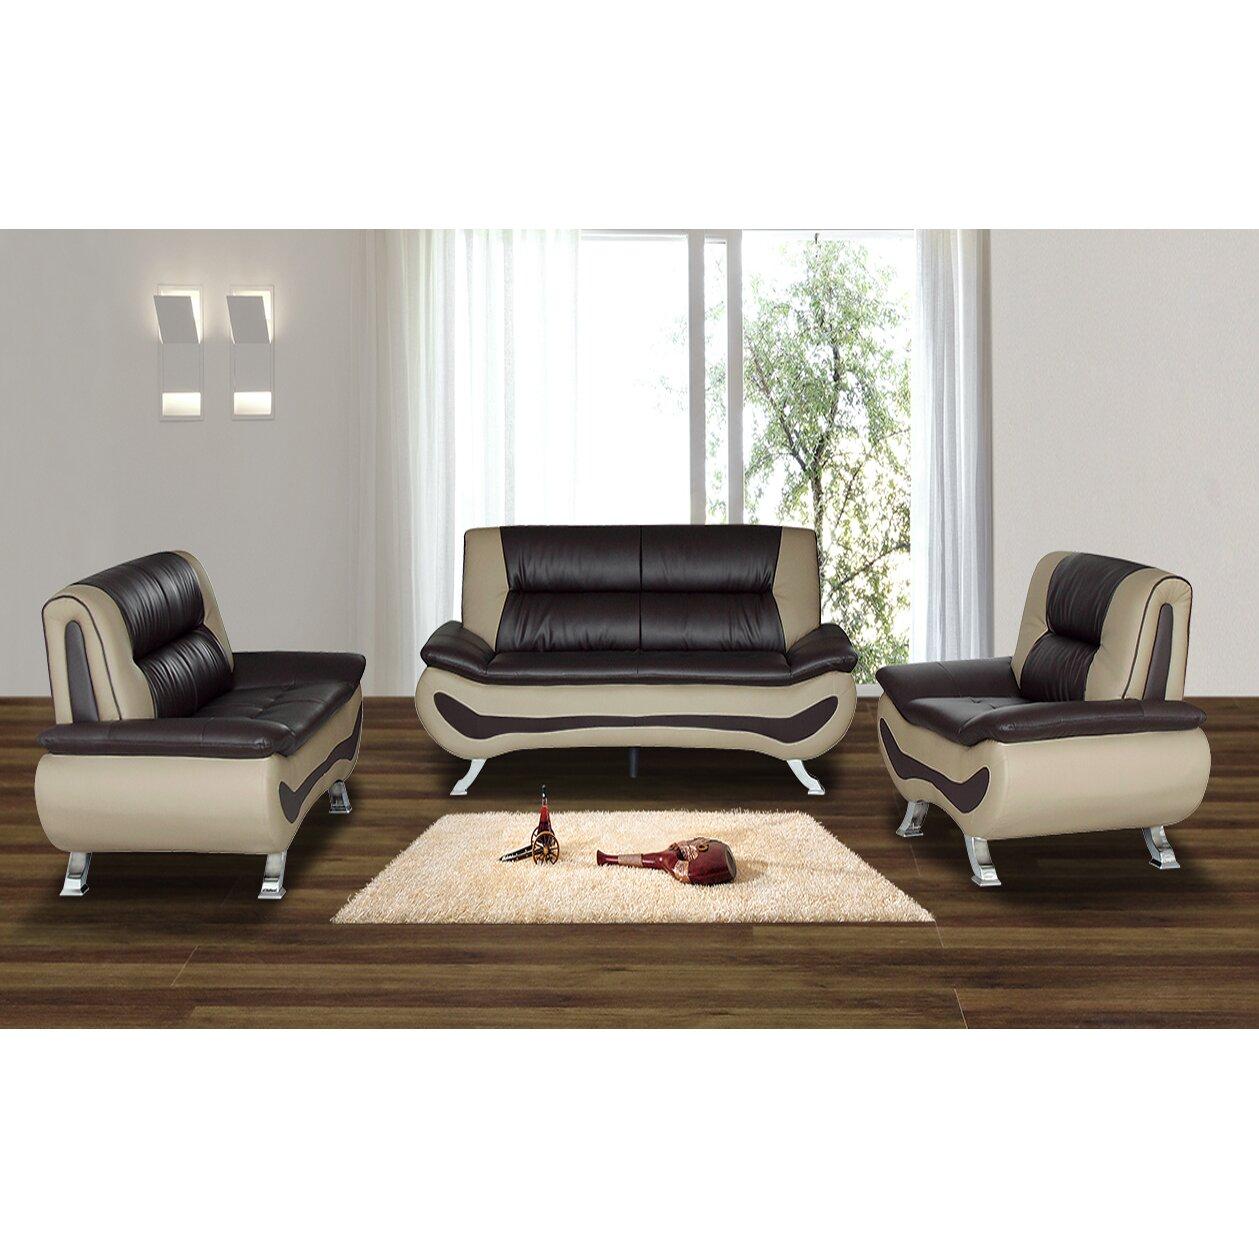 wade logan berkeley heights 3 piece living room set reviews. Black Bedroom Furniture Sets. Home Design Ideas